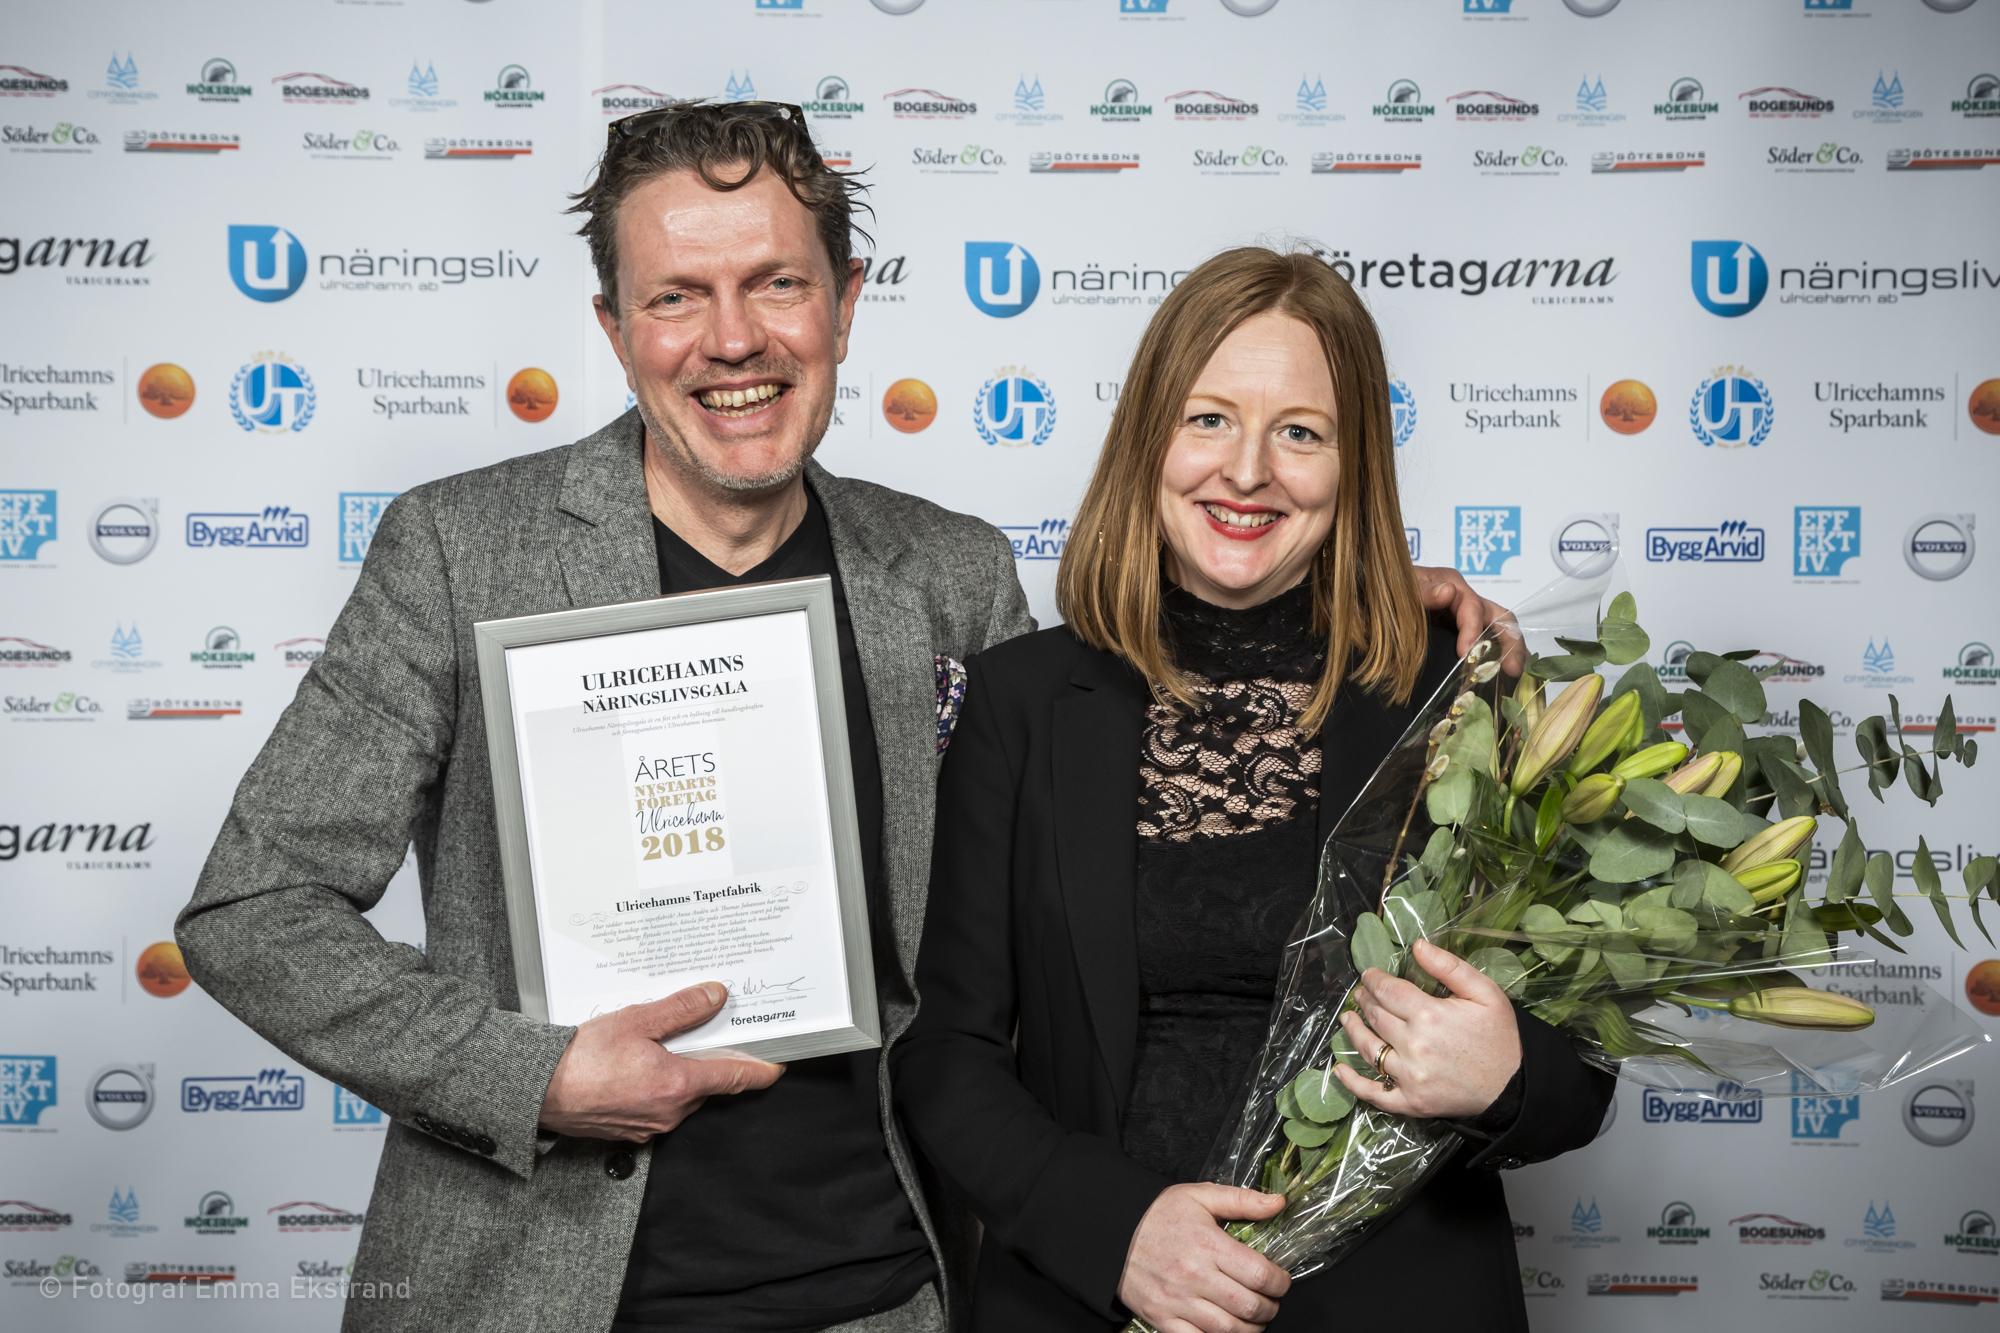 Årets Nystartsföretag 2018 - Ulricehamns Tapetfabrik